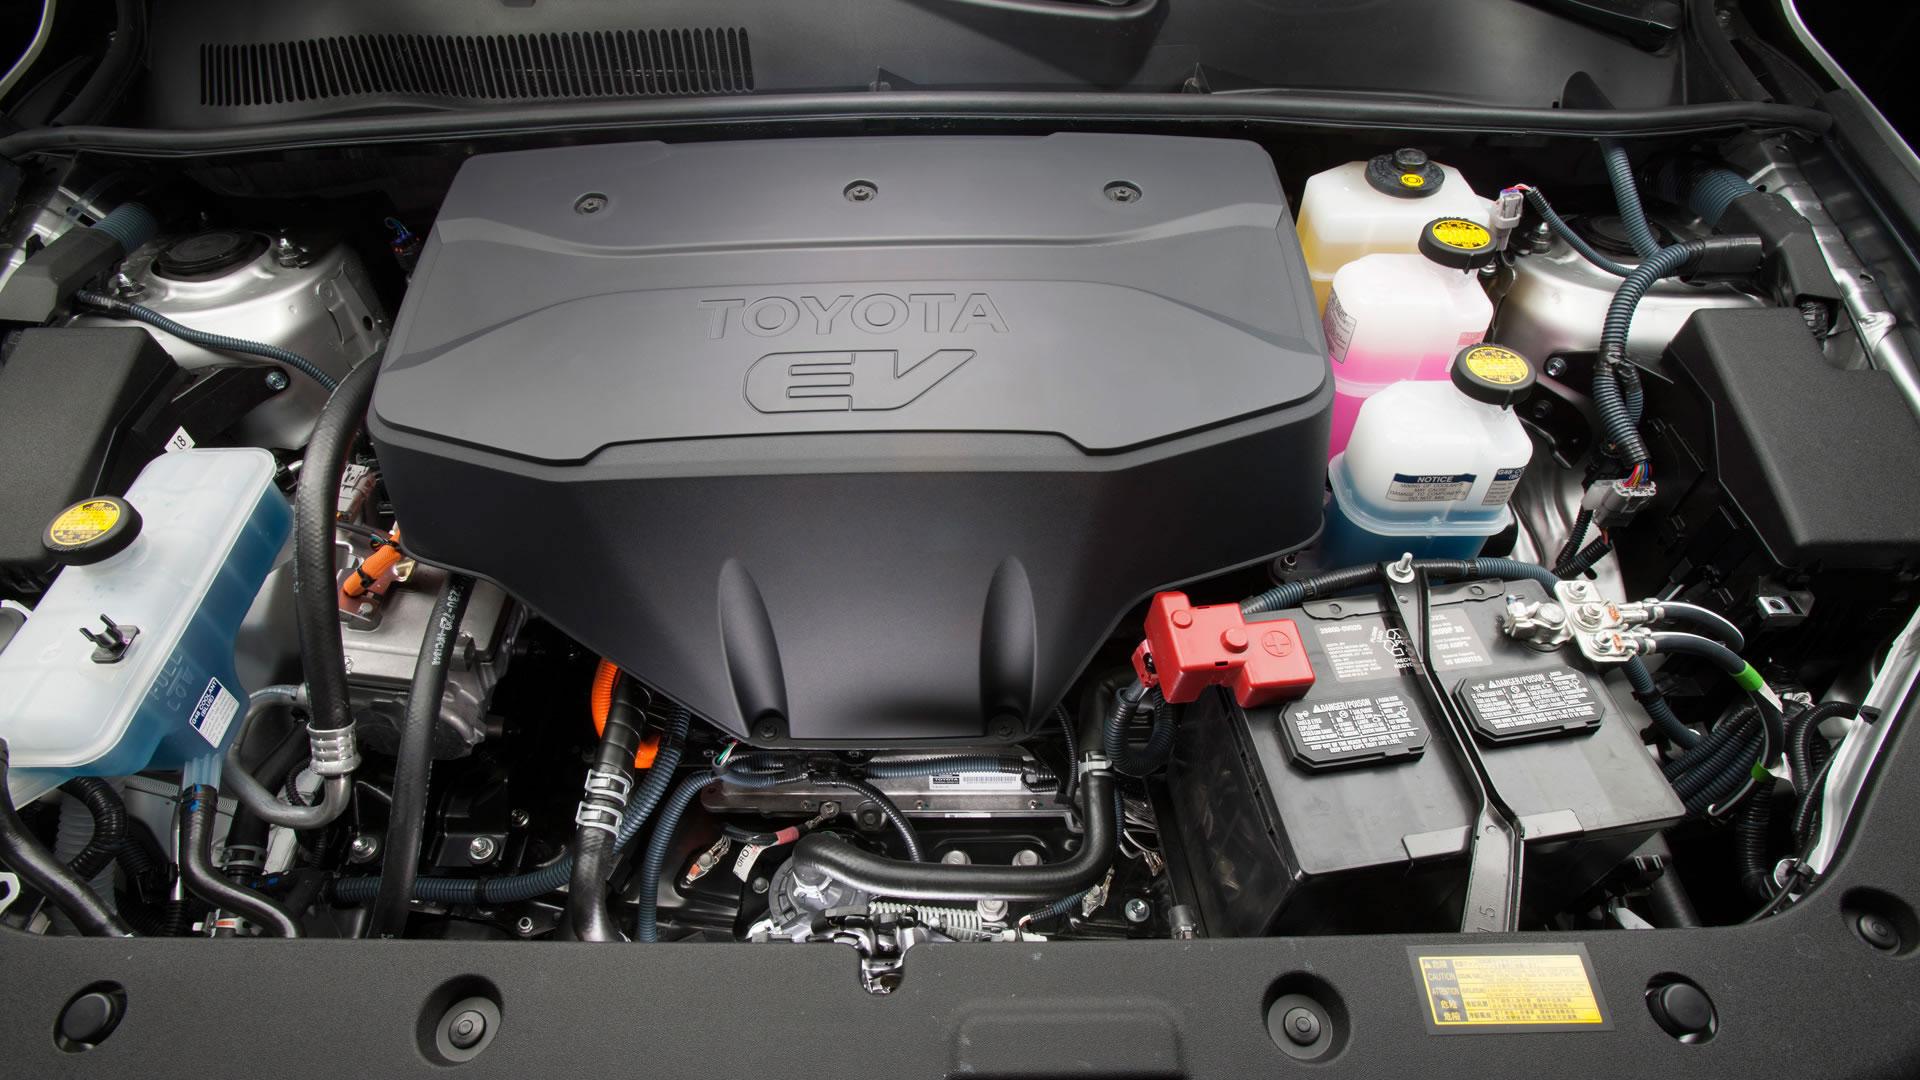 of cancel toyota ev owner car plugincars the com compliance contemplates future will img